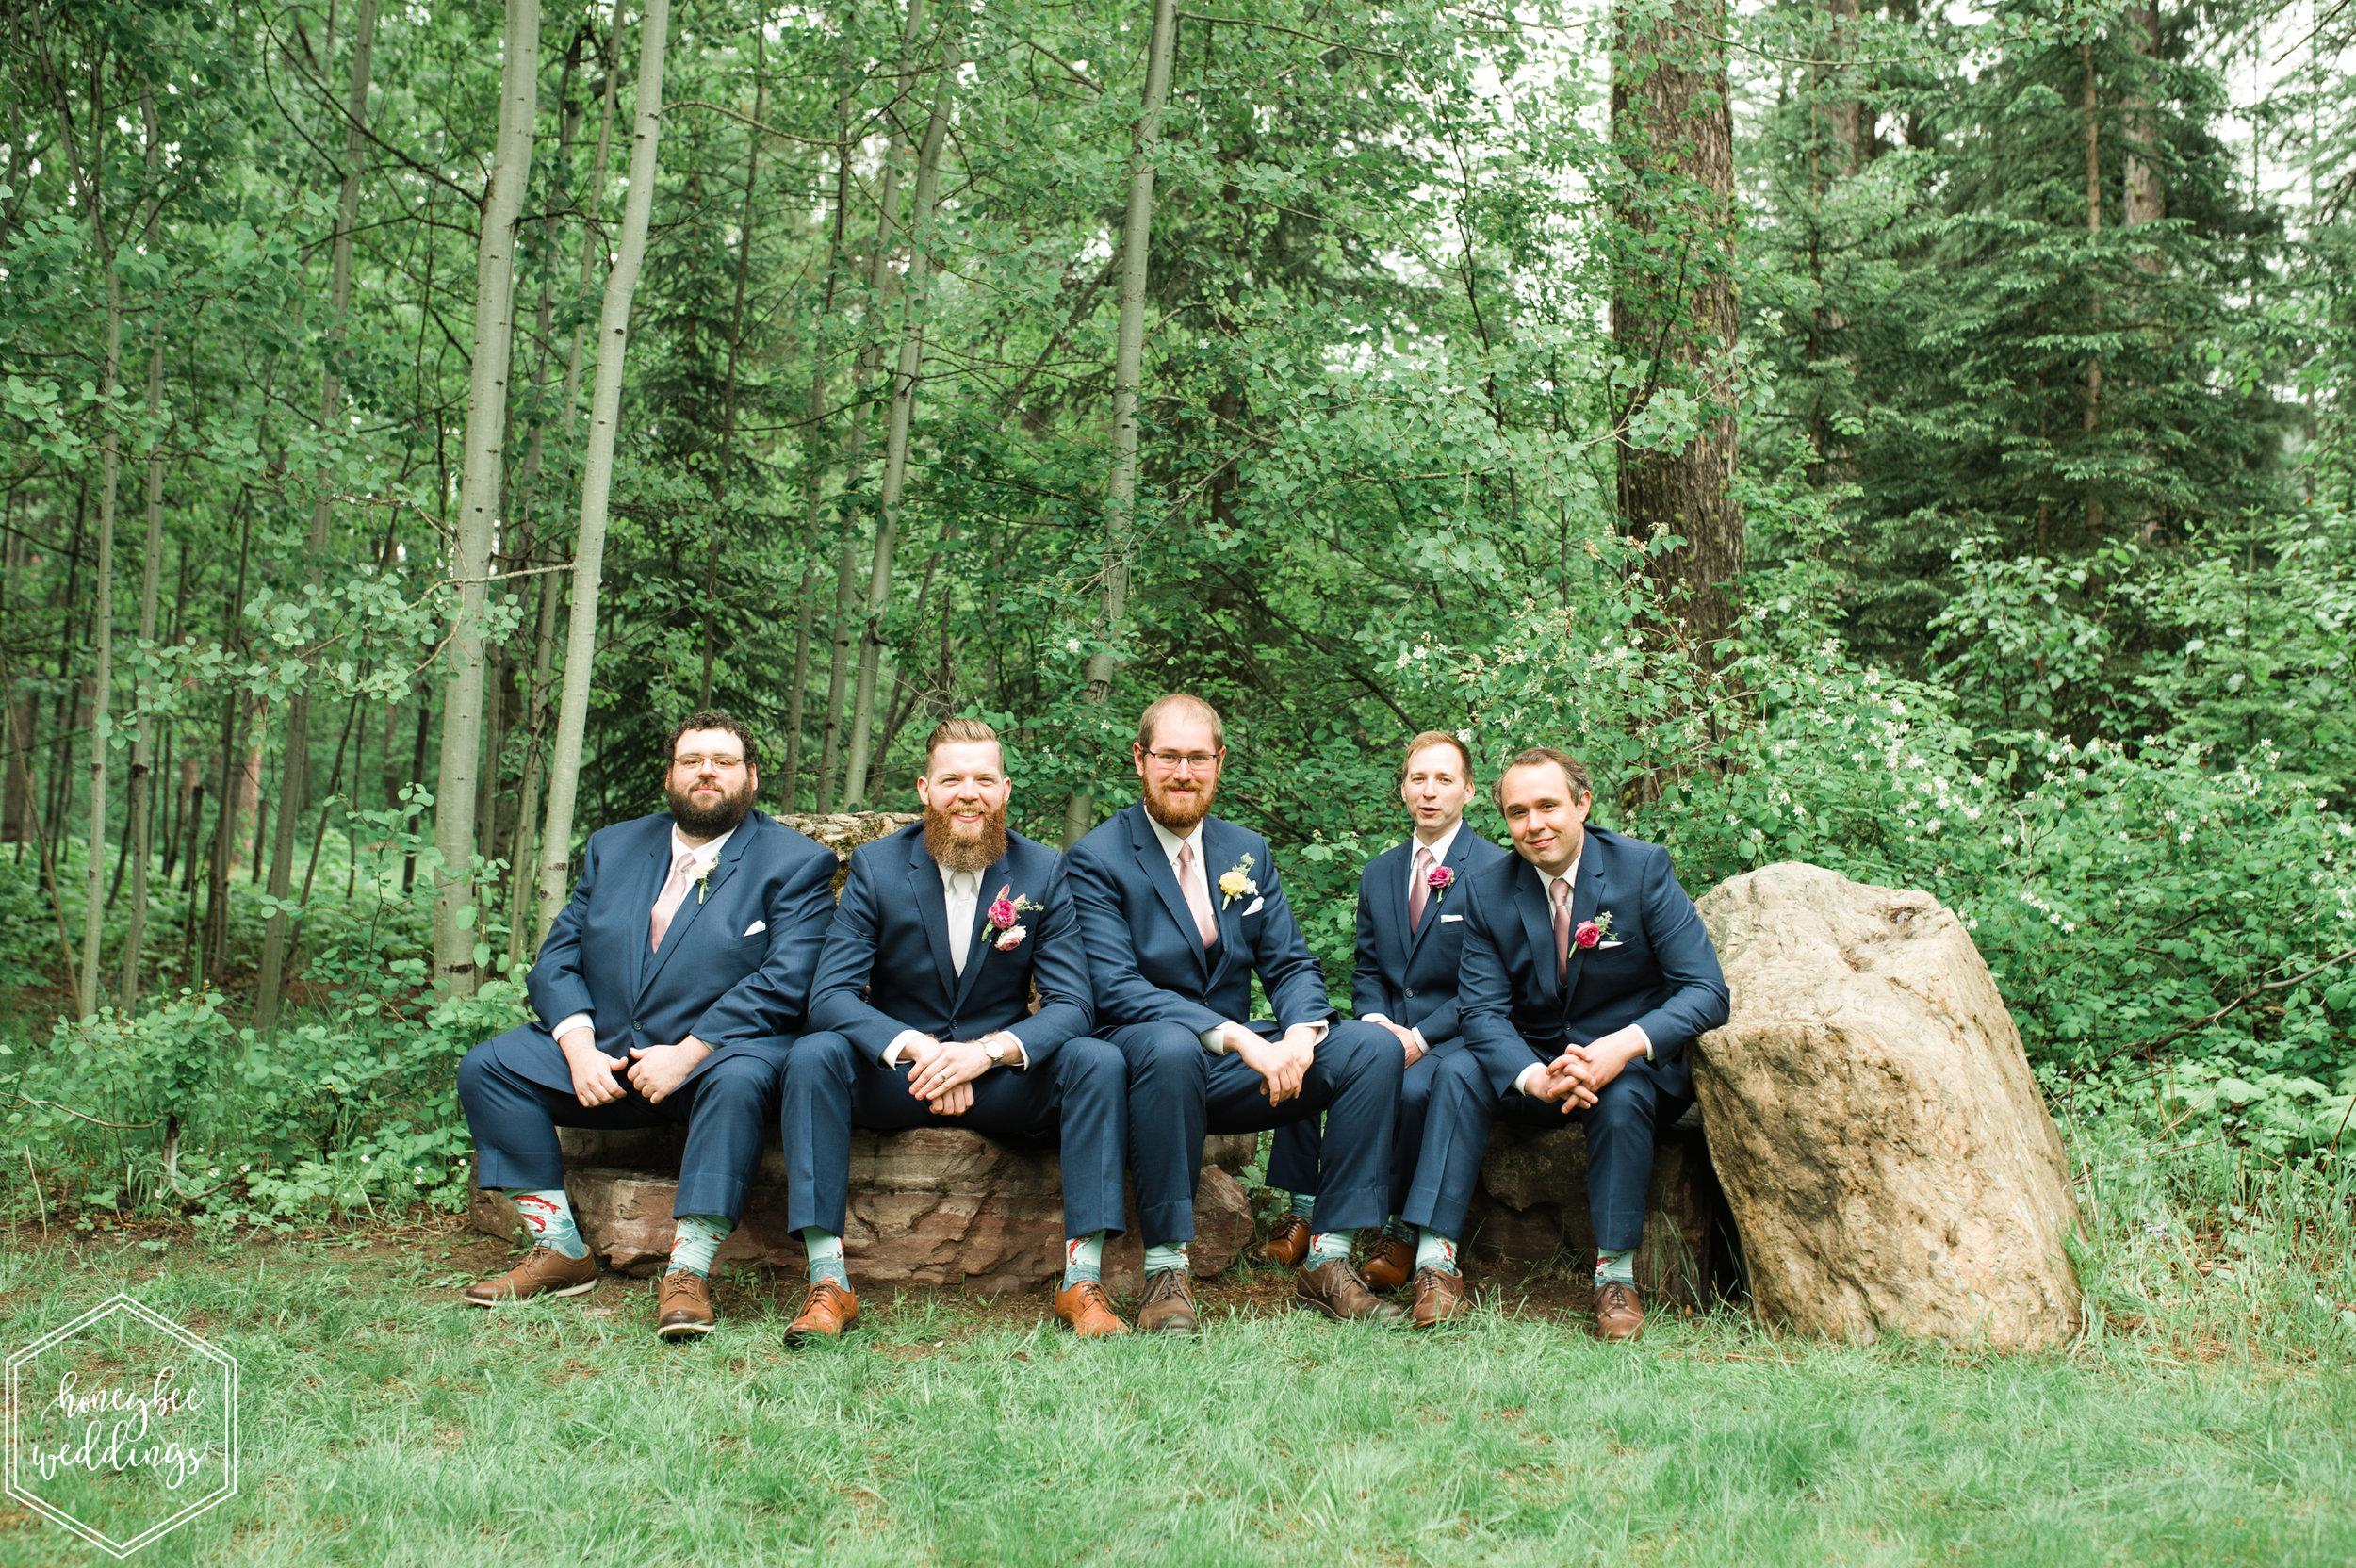 092Glacier National Park Wedding_Izaak Walton Inn Wedding_Honeybee Weddings_Norah & Kyle_June 08, 2019-700.jpg